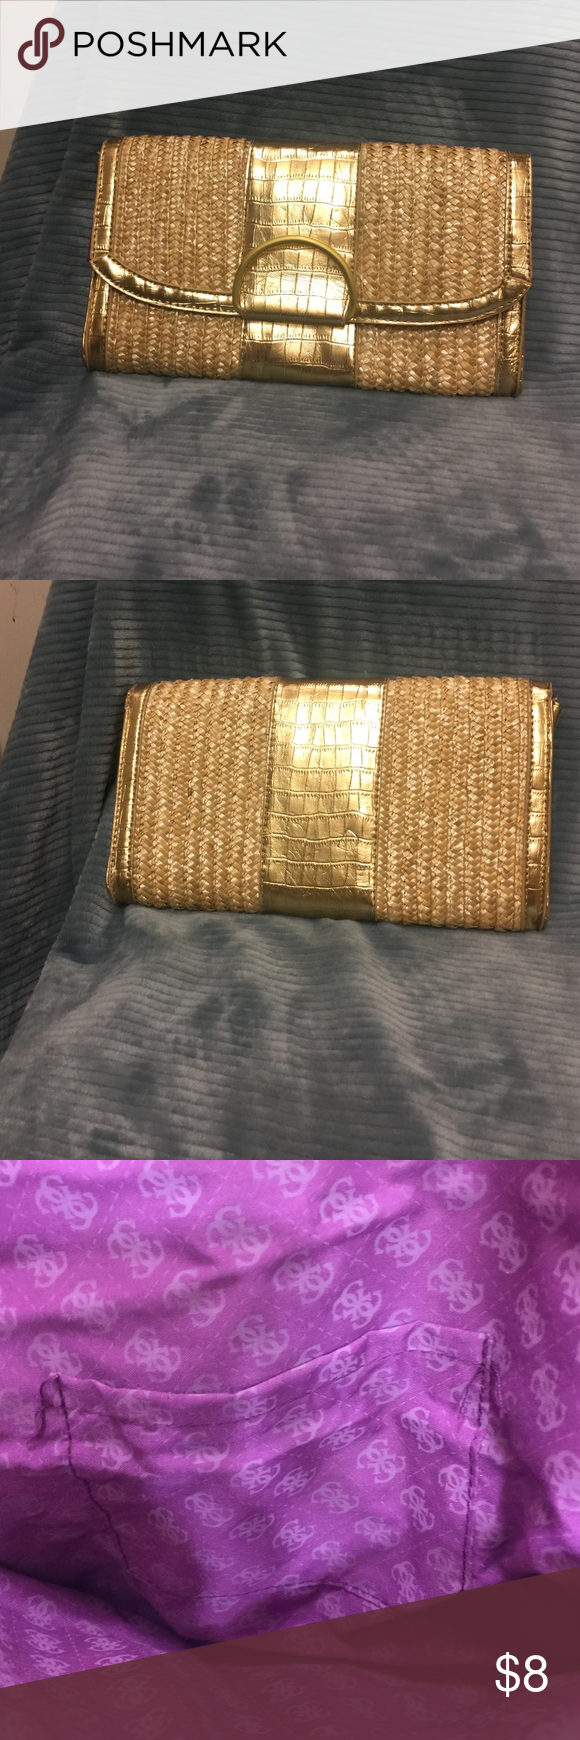 A wicker metallic gold basket clutch purse Trendy Bags Clutches & Wristlets